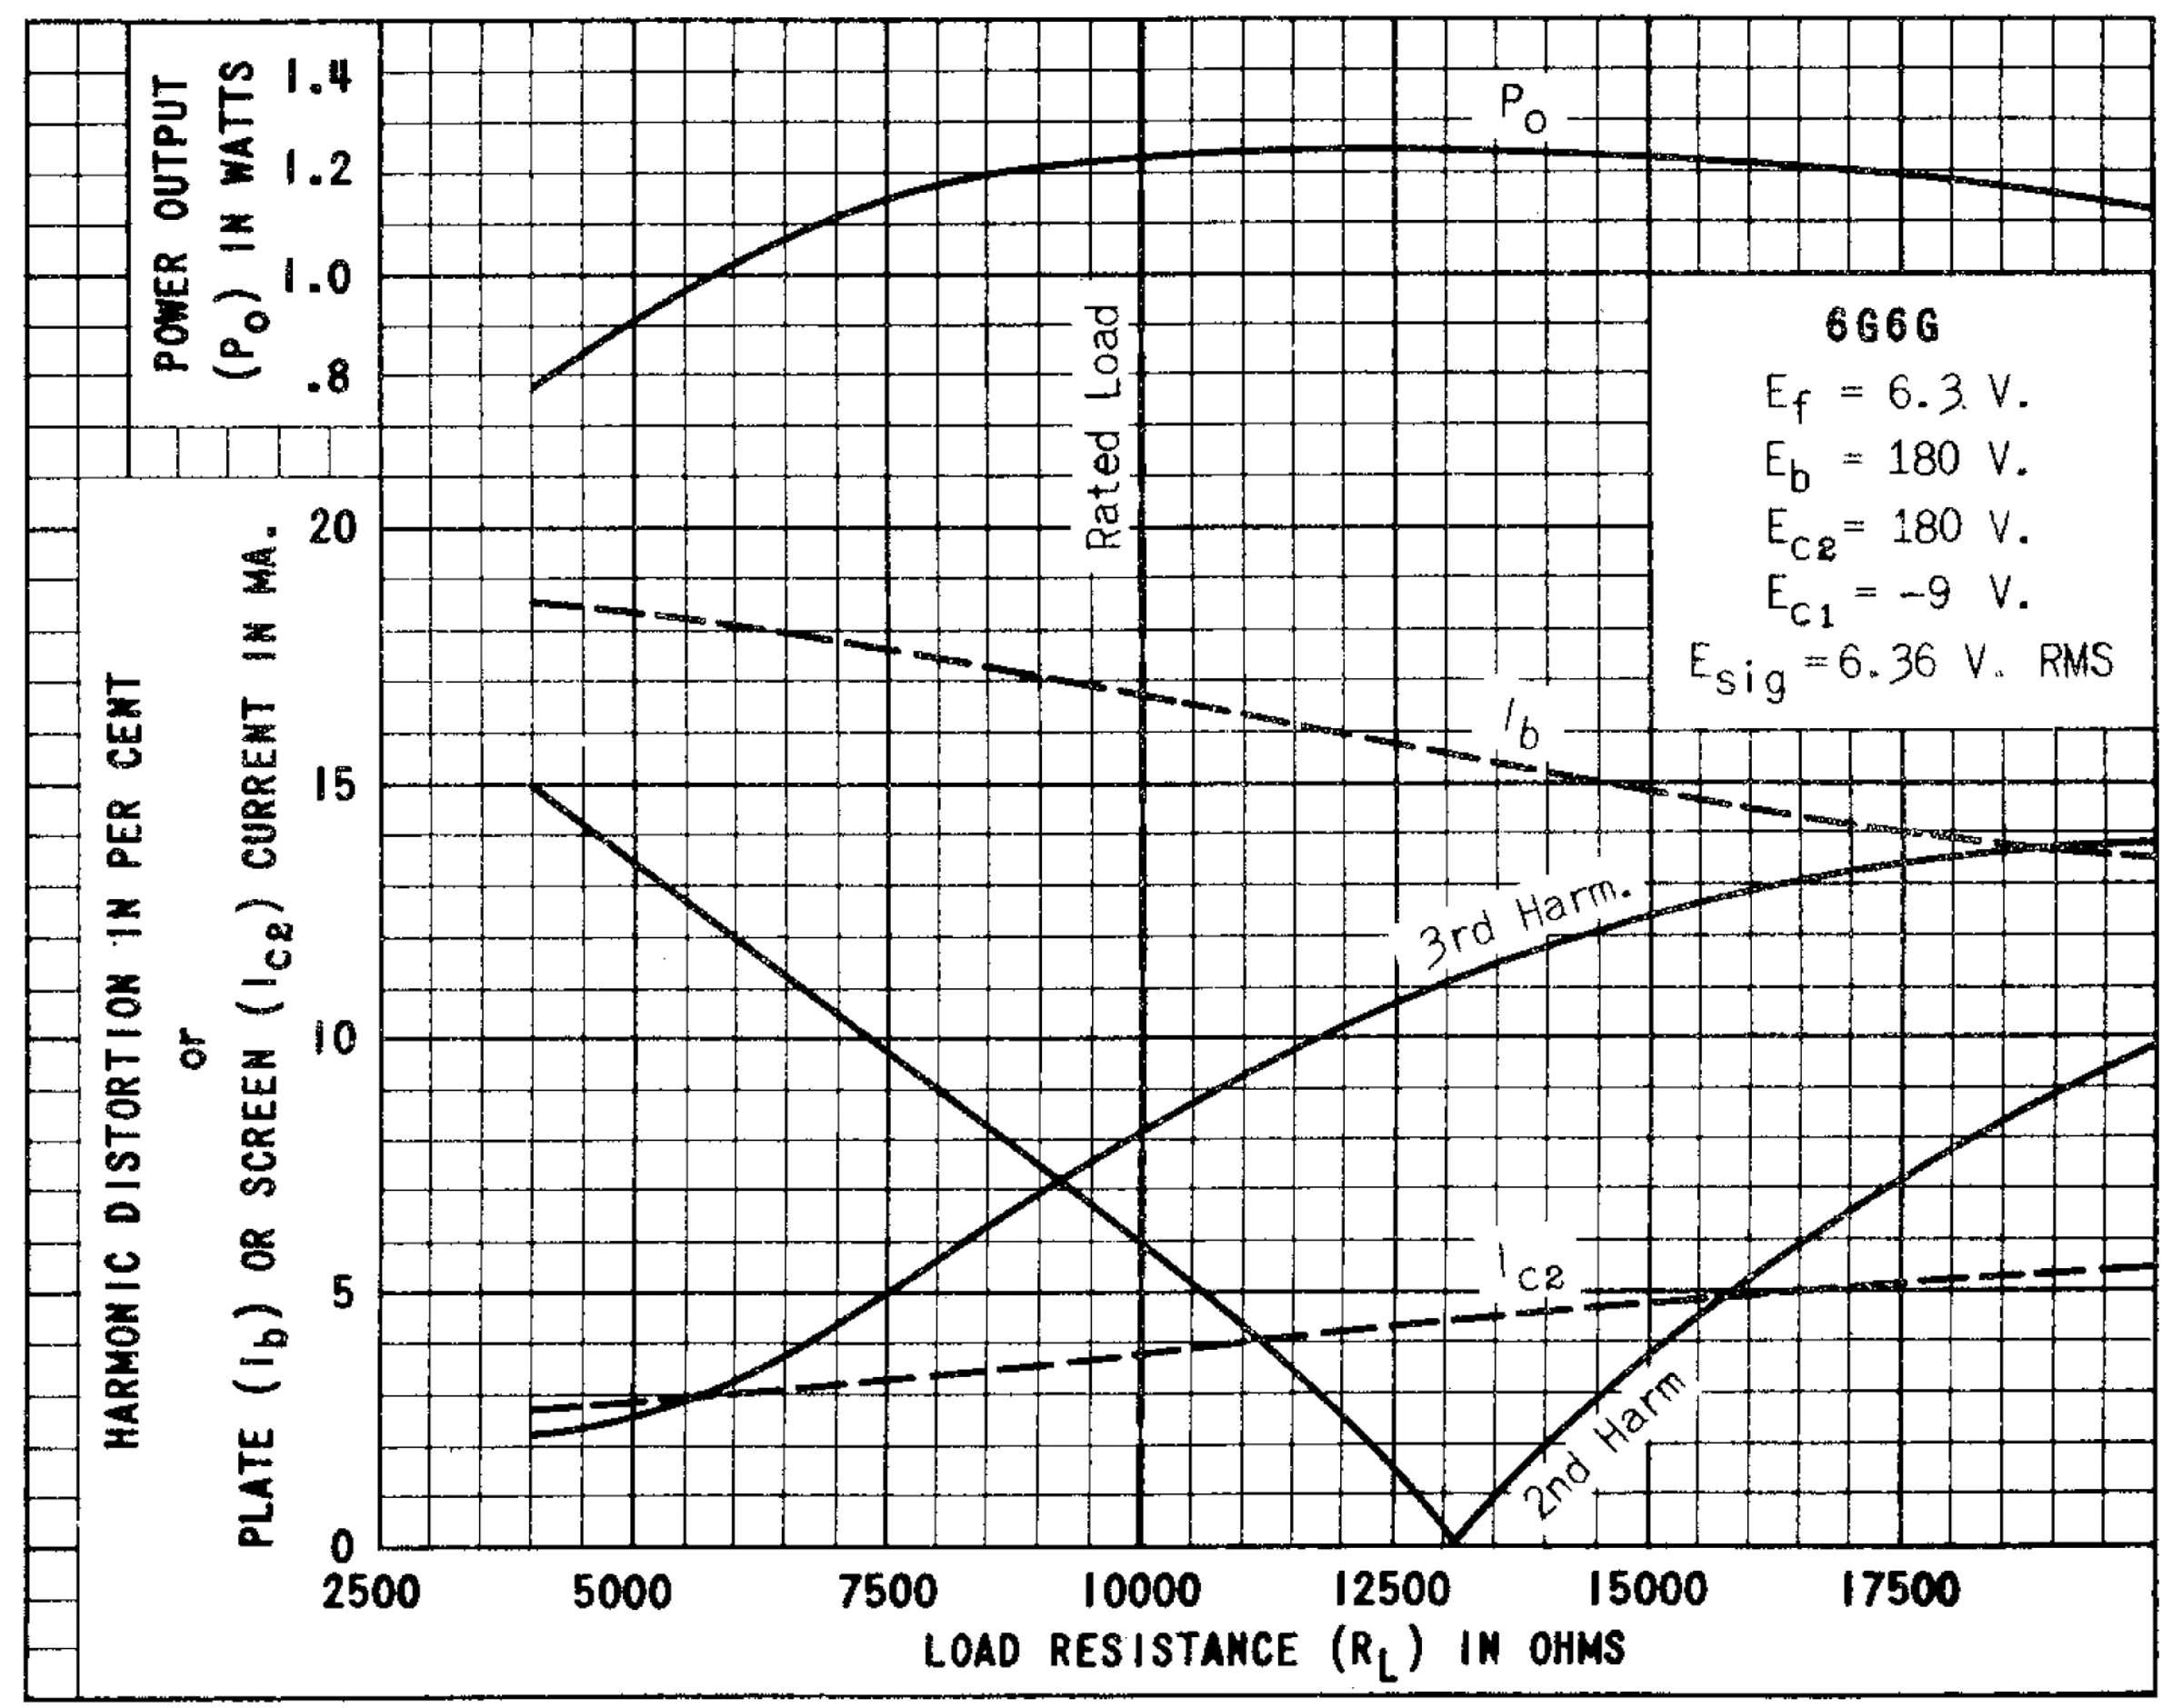 Параметры радиолампы 6G6G